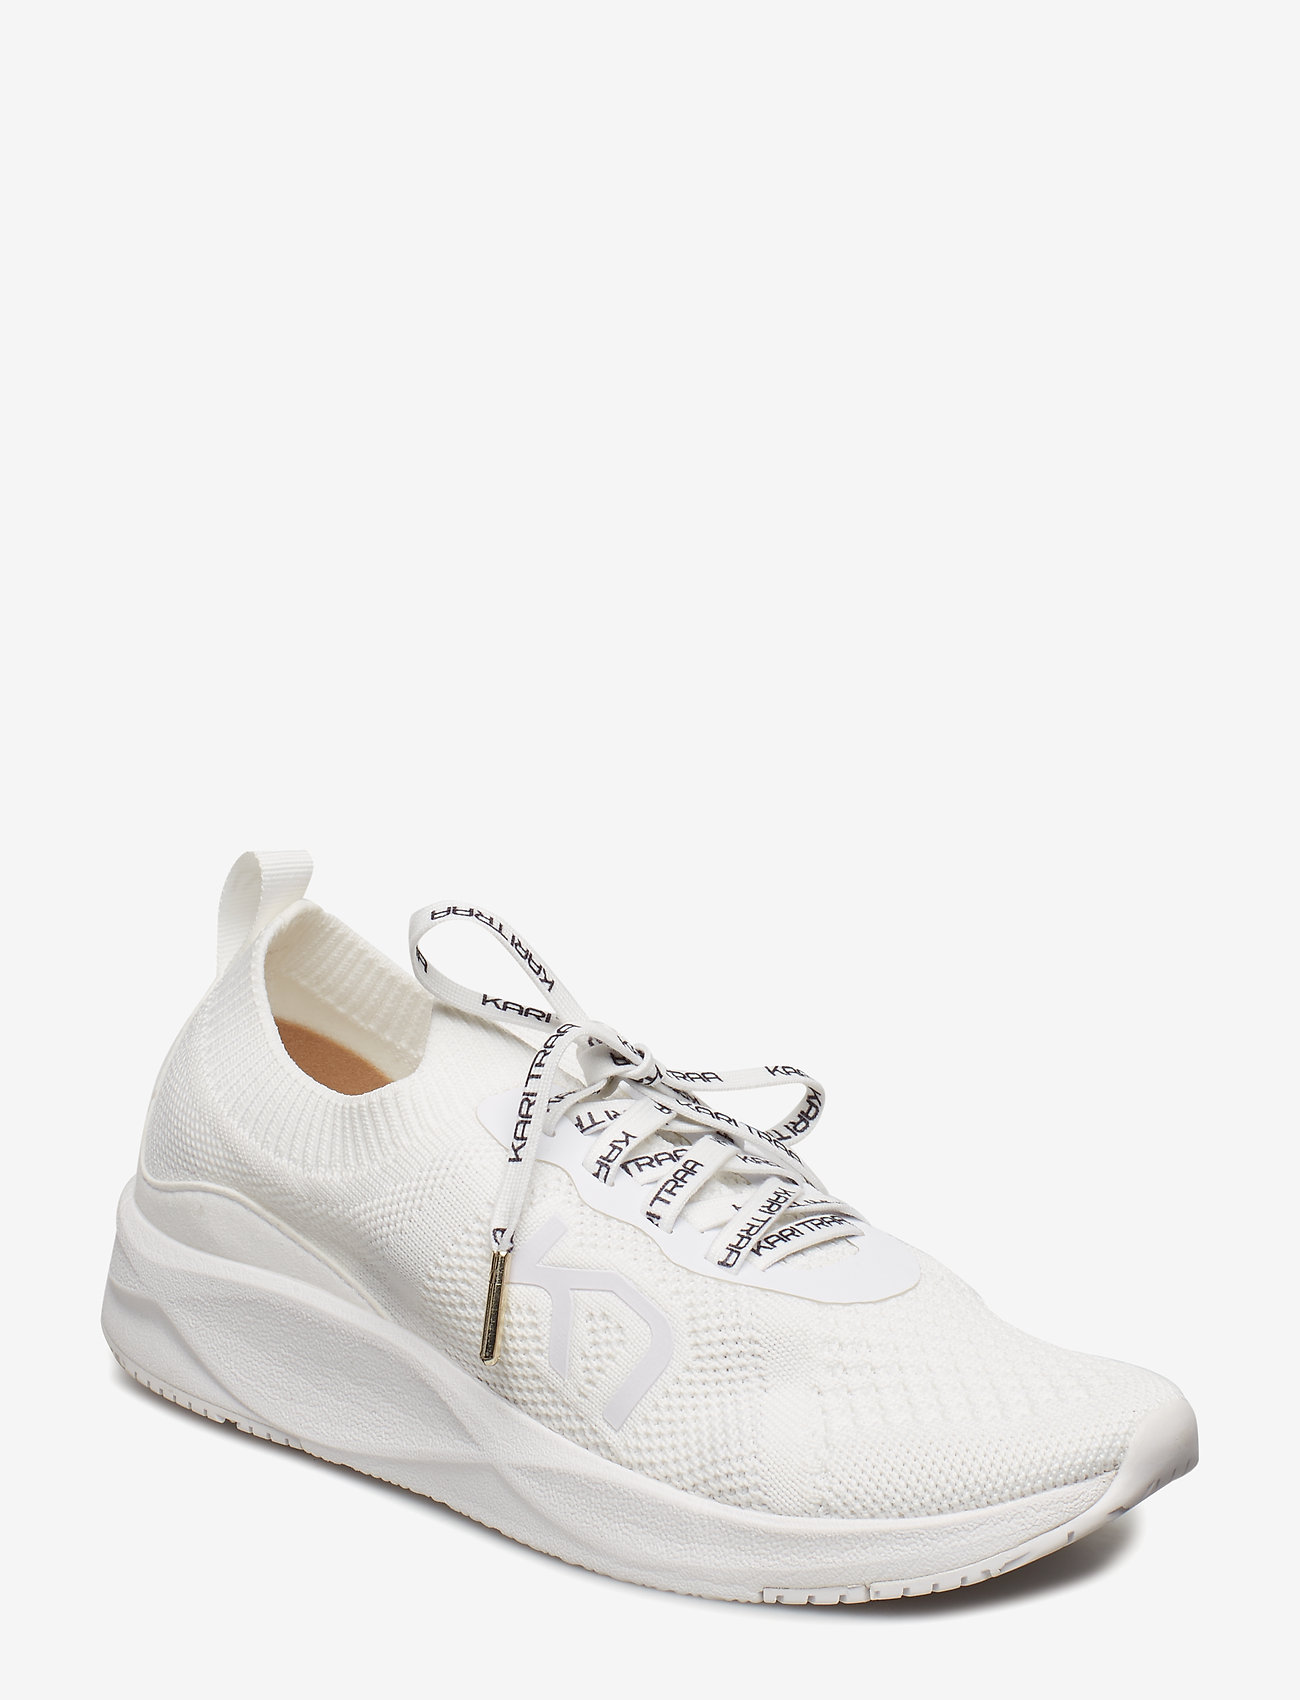 Kari Traa - BYKS - low top sneakers - white - 0